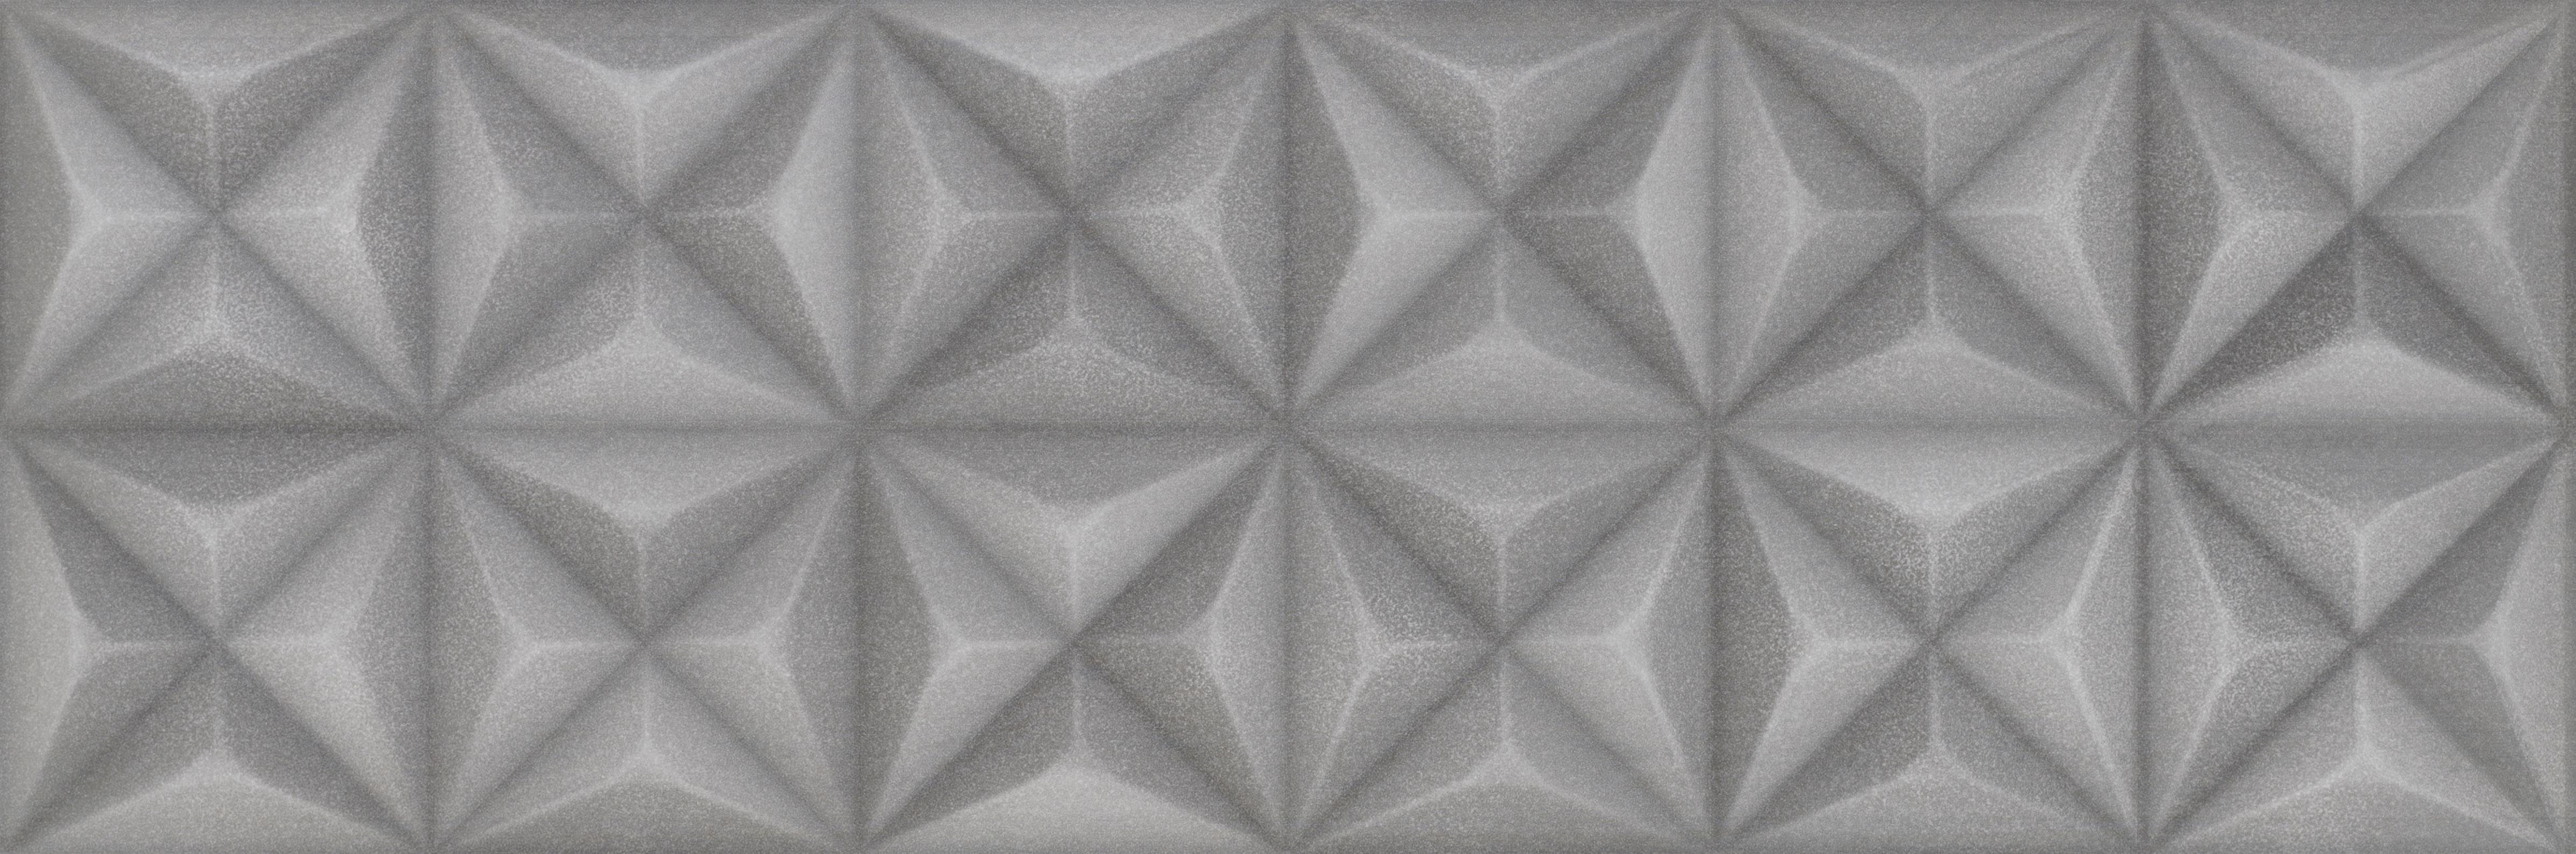 SENSORIAL DIAMOND GRMLX